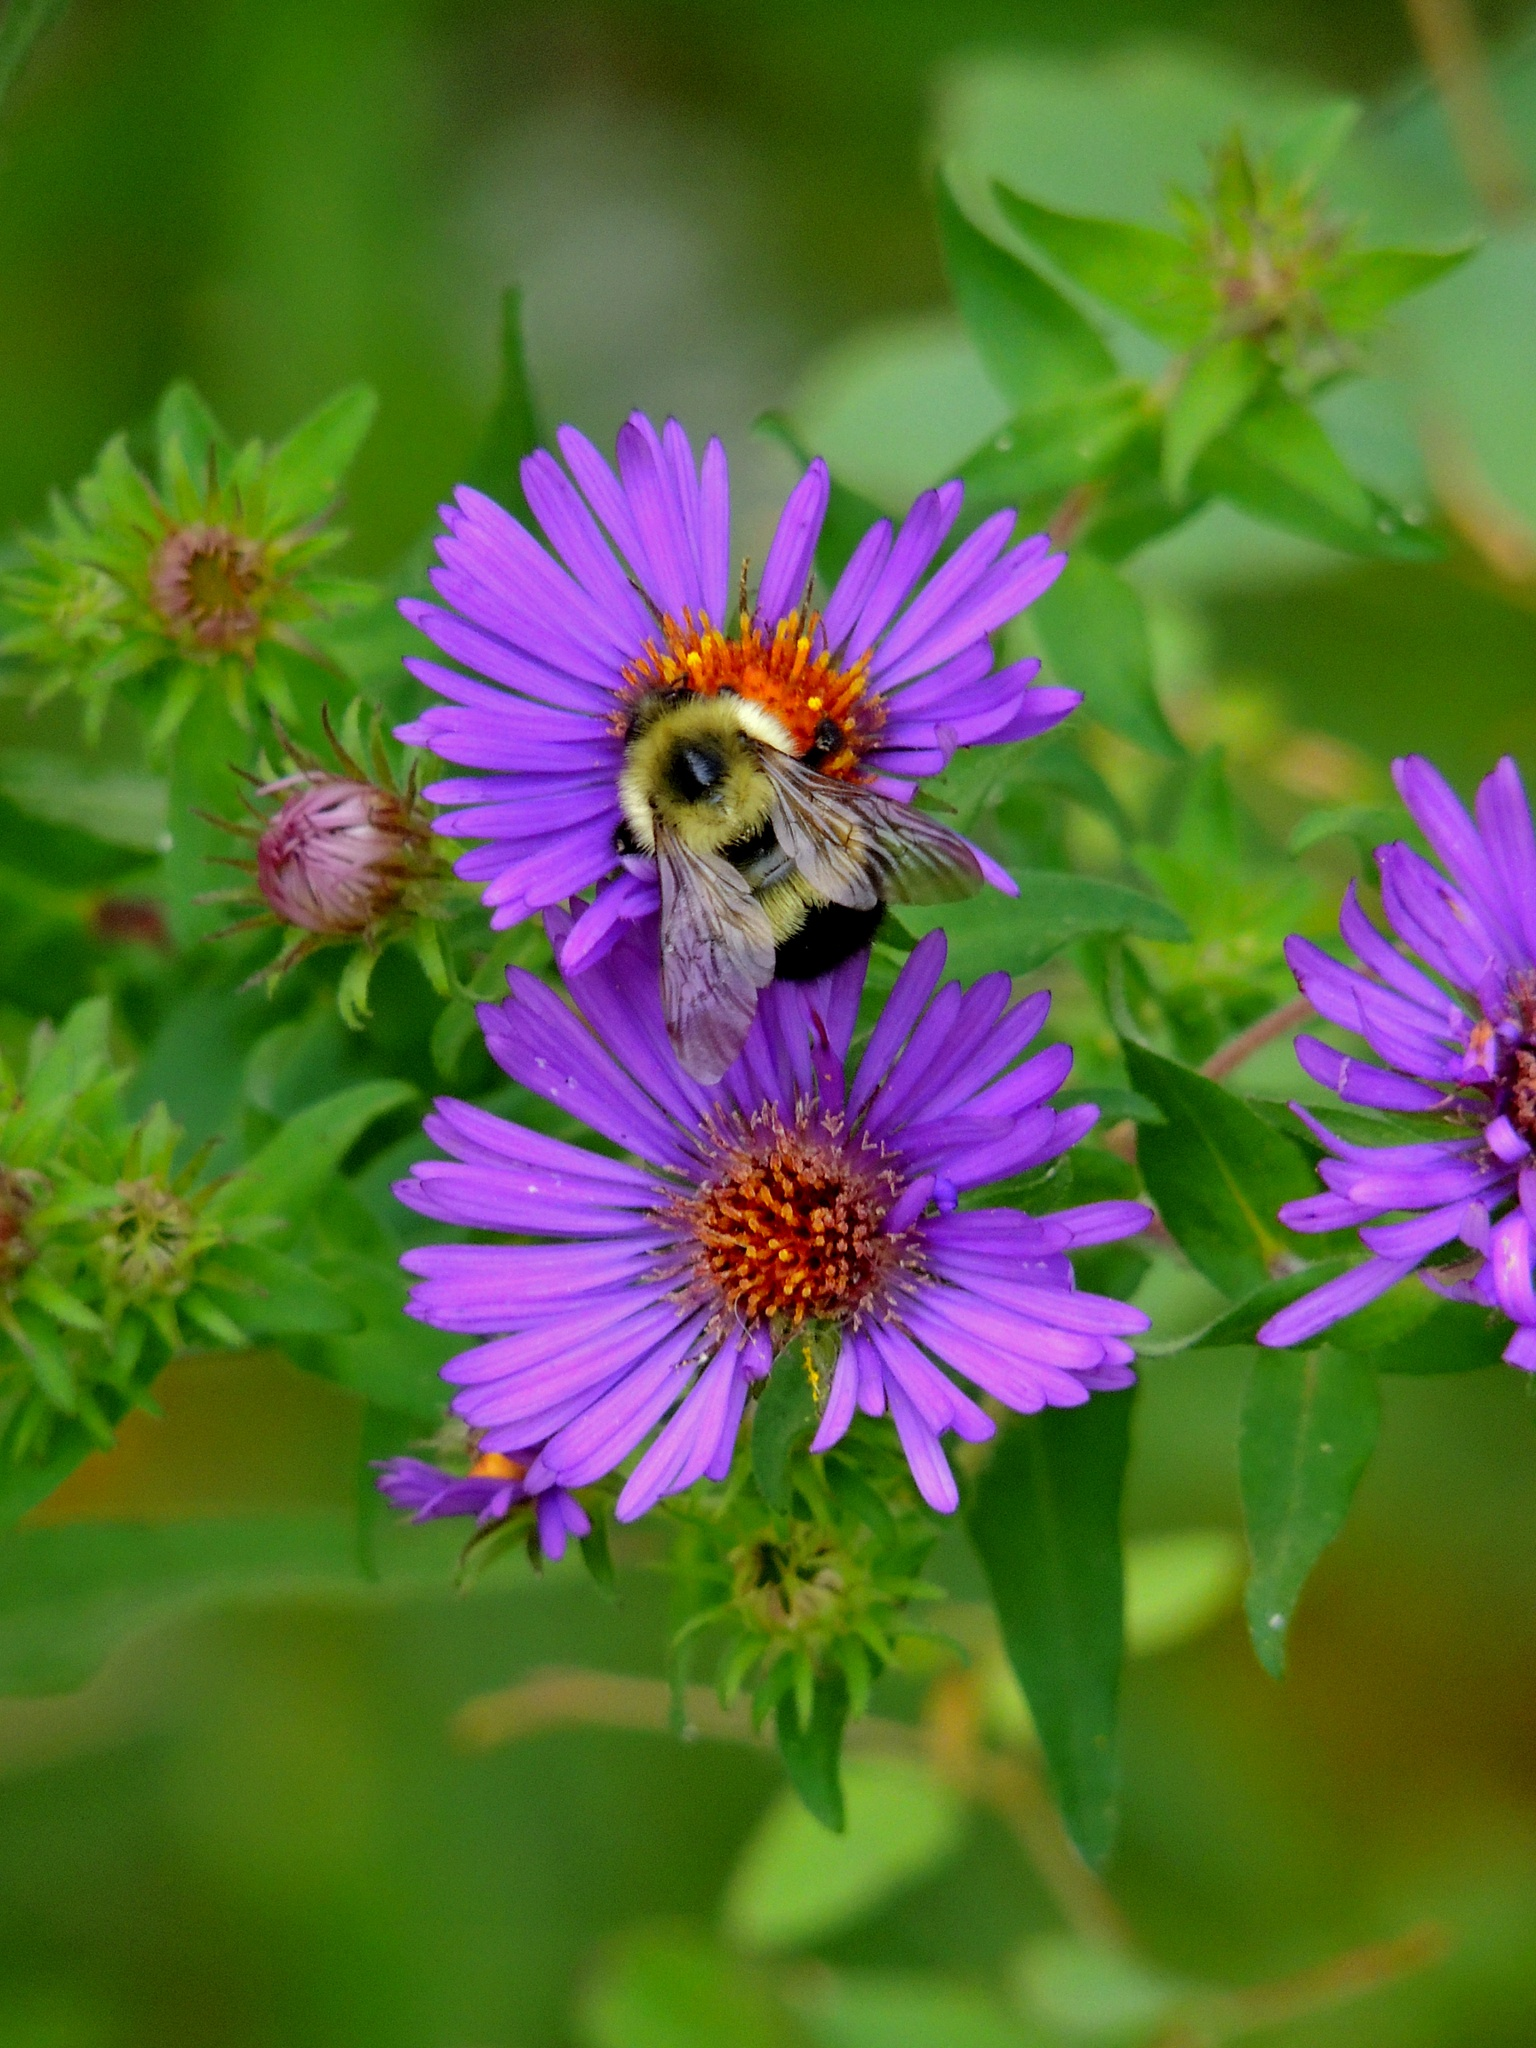 Busy Bee by carol.capozzi.18